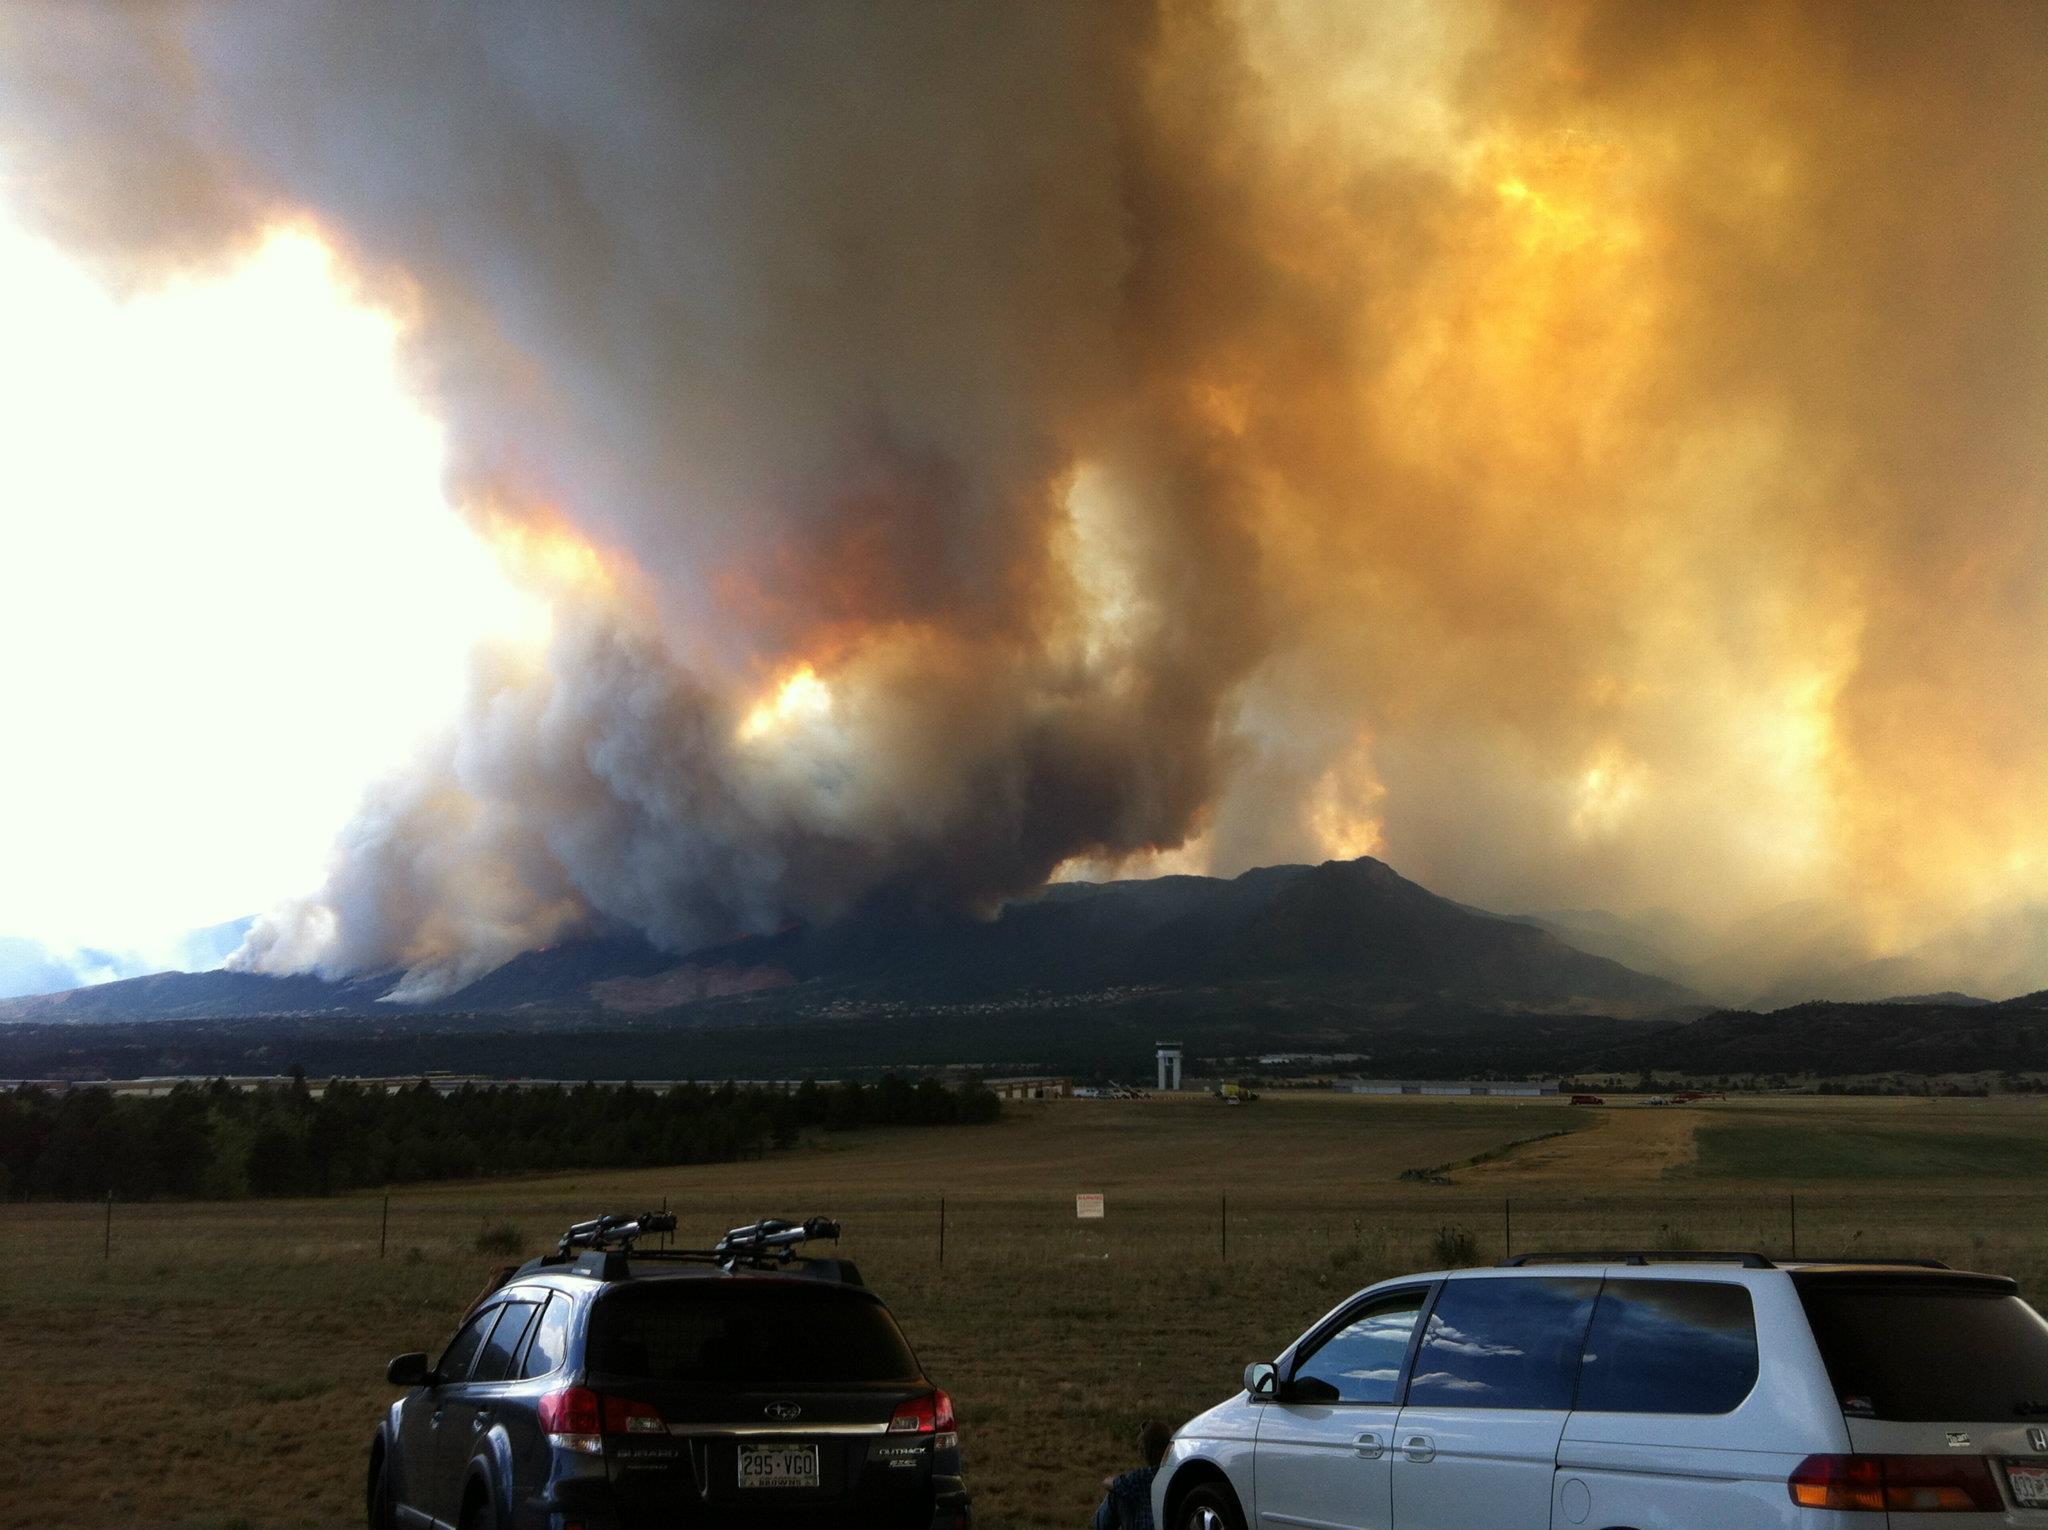 Smoke from Waldo Canyon wildfire in Colorado